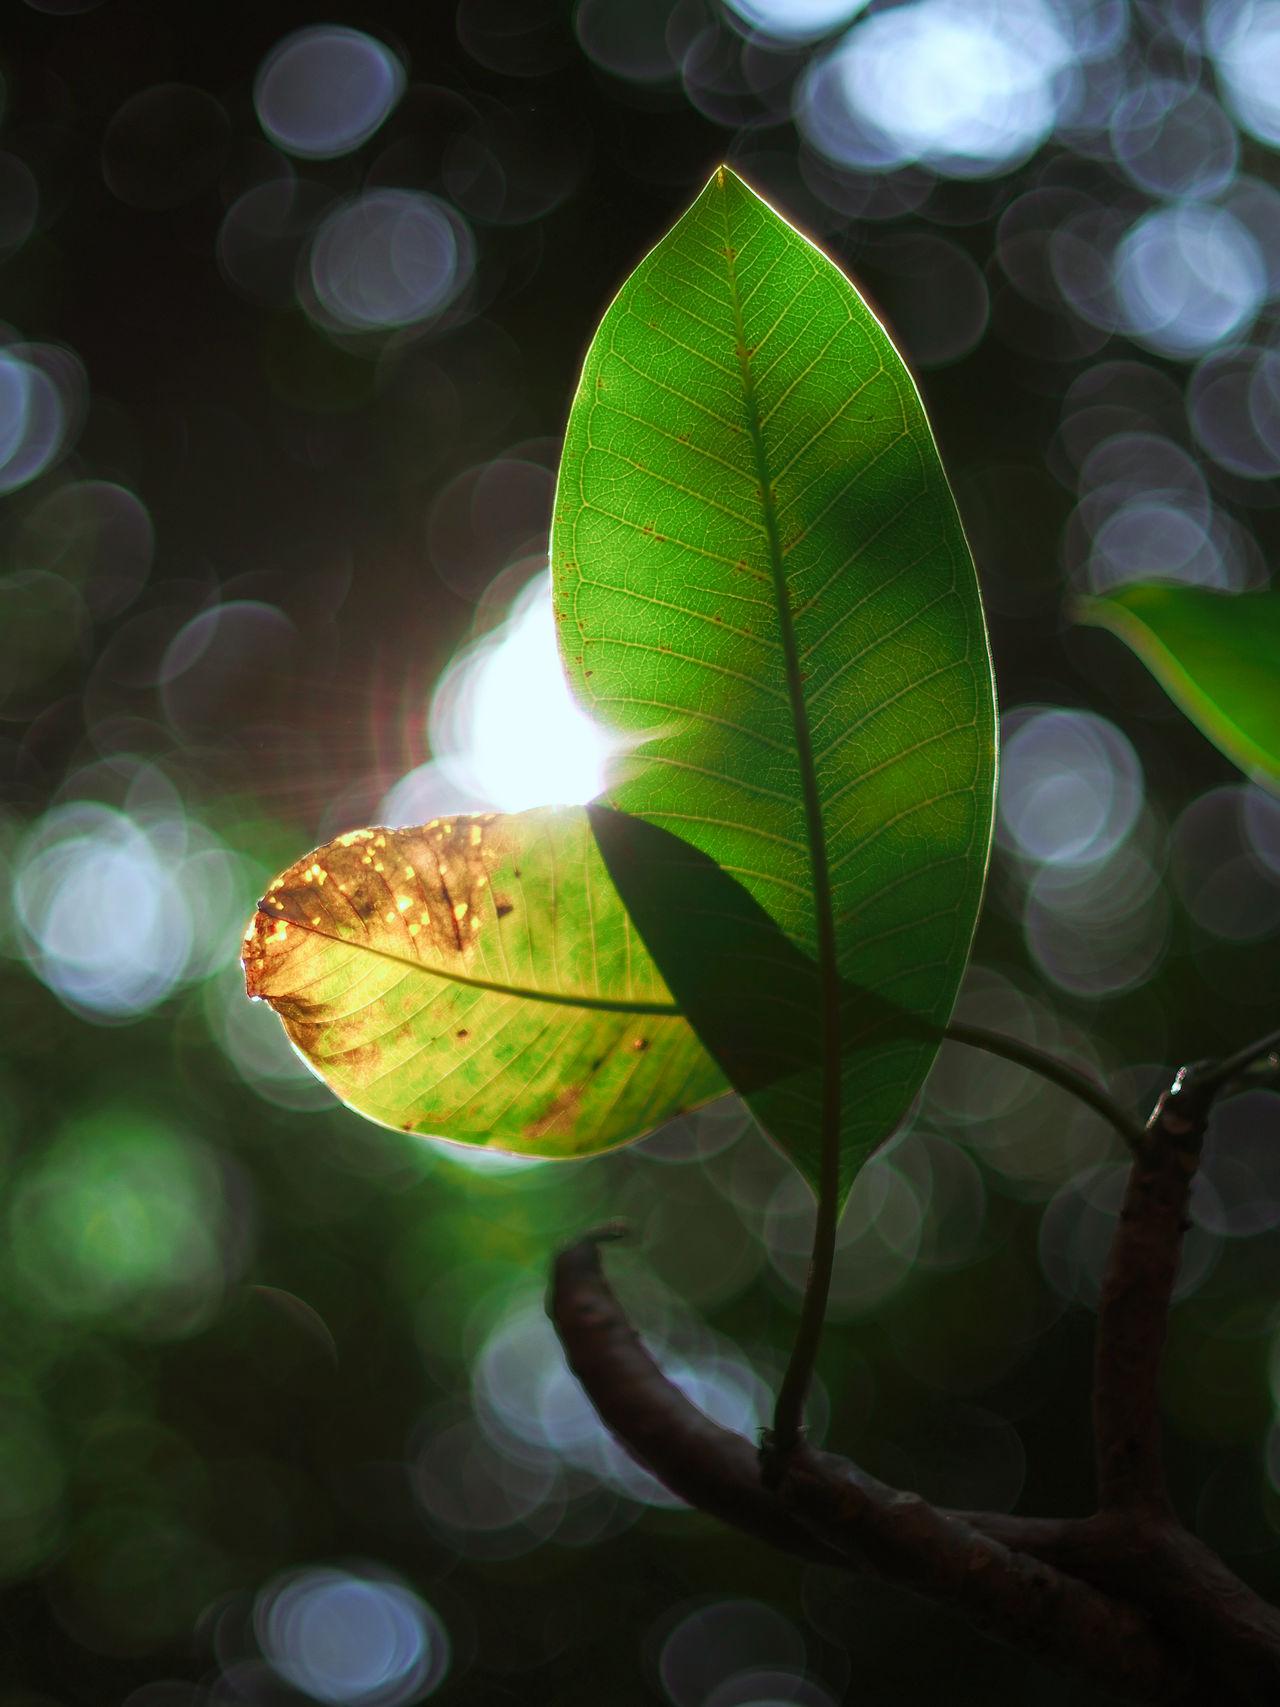 Plant Leaves🌿 Lens Flare Flarelight Nature Sunbeam Beauty In Nature Autumn🍁🍁🍁 Back Lit TakeoverContrast 50mm 1.4 Bokeh Balls Bokeh Love Bokeh Lights Botany Bokeh Photography Selective Focus